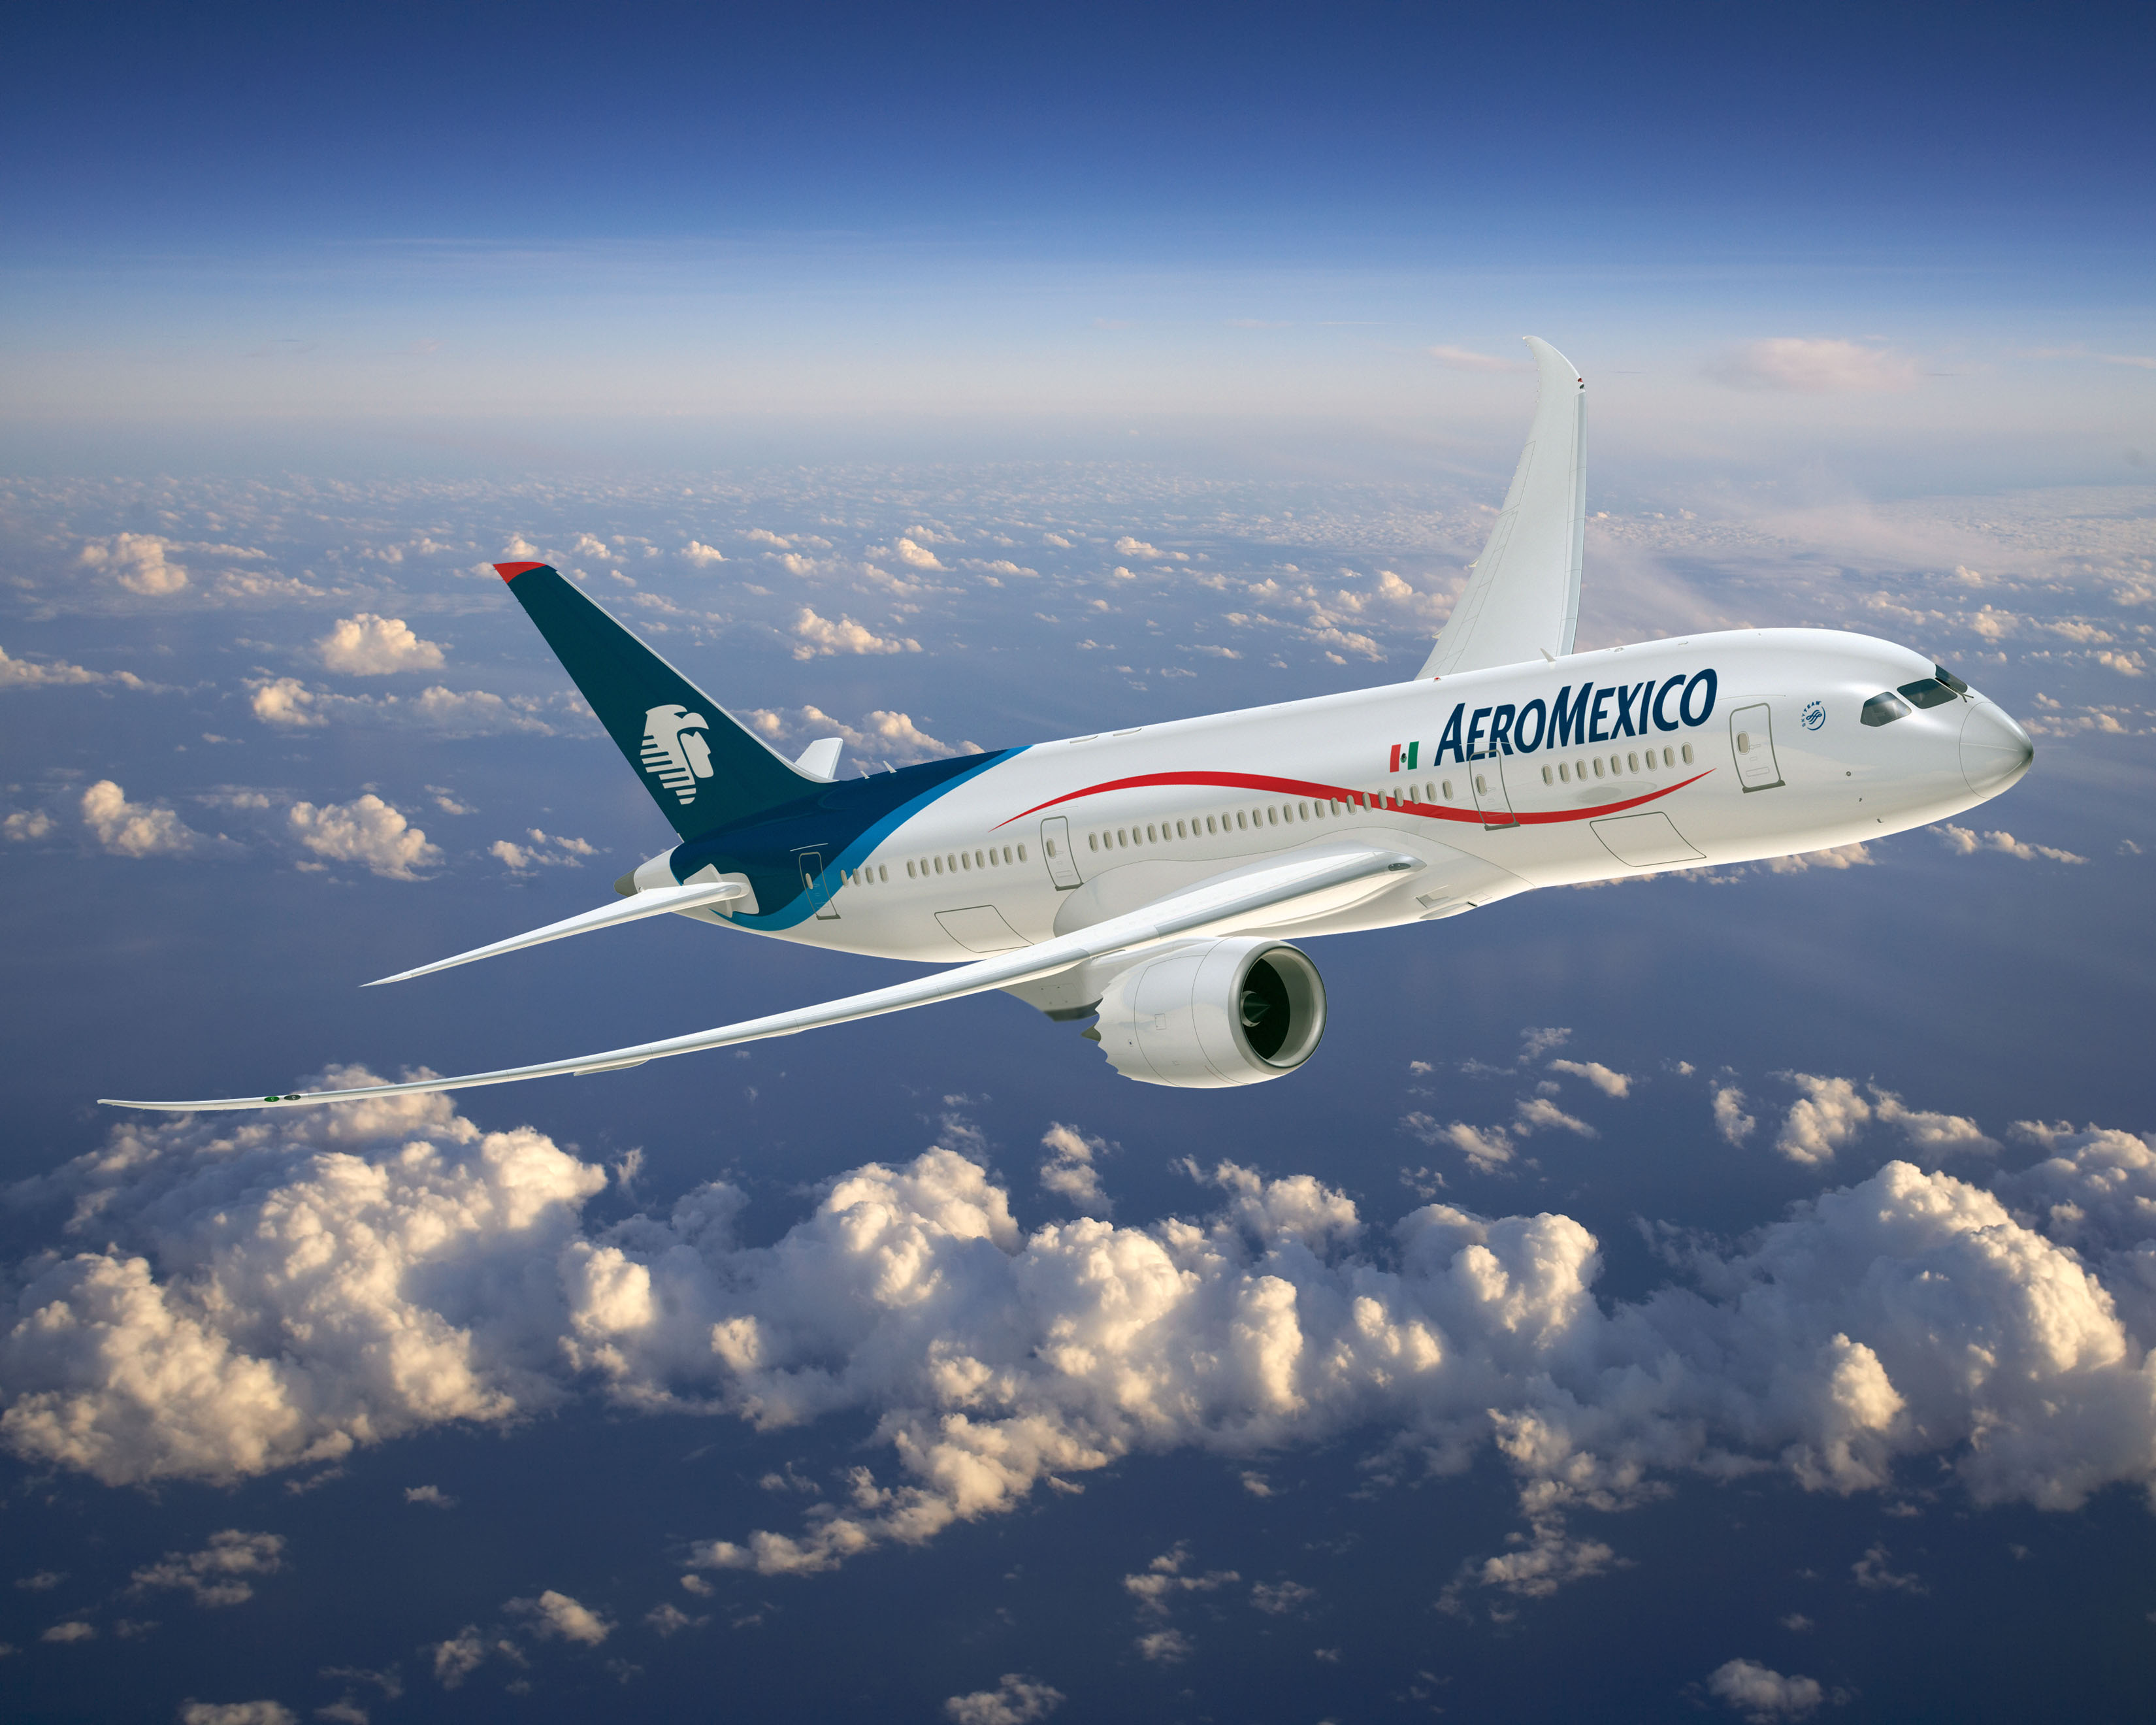 Aerial transport translation Aeromexico